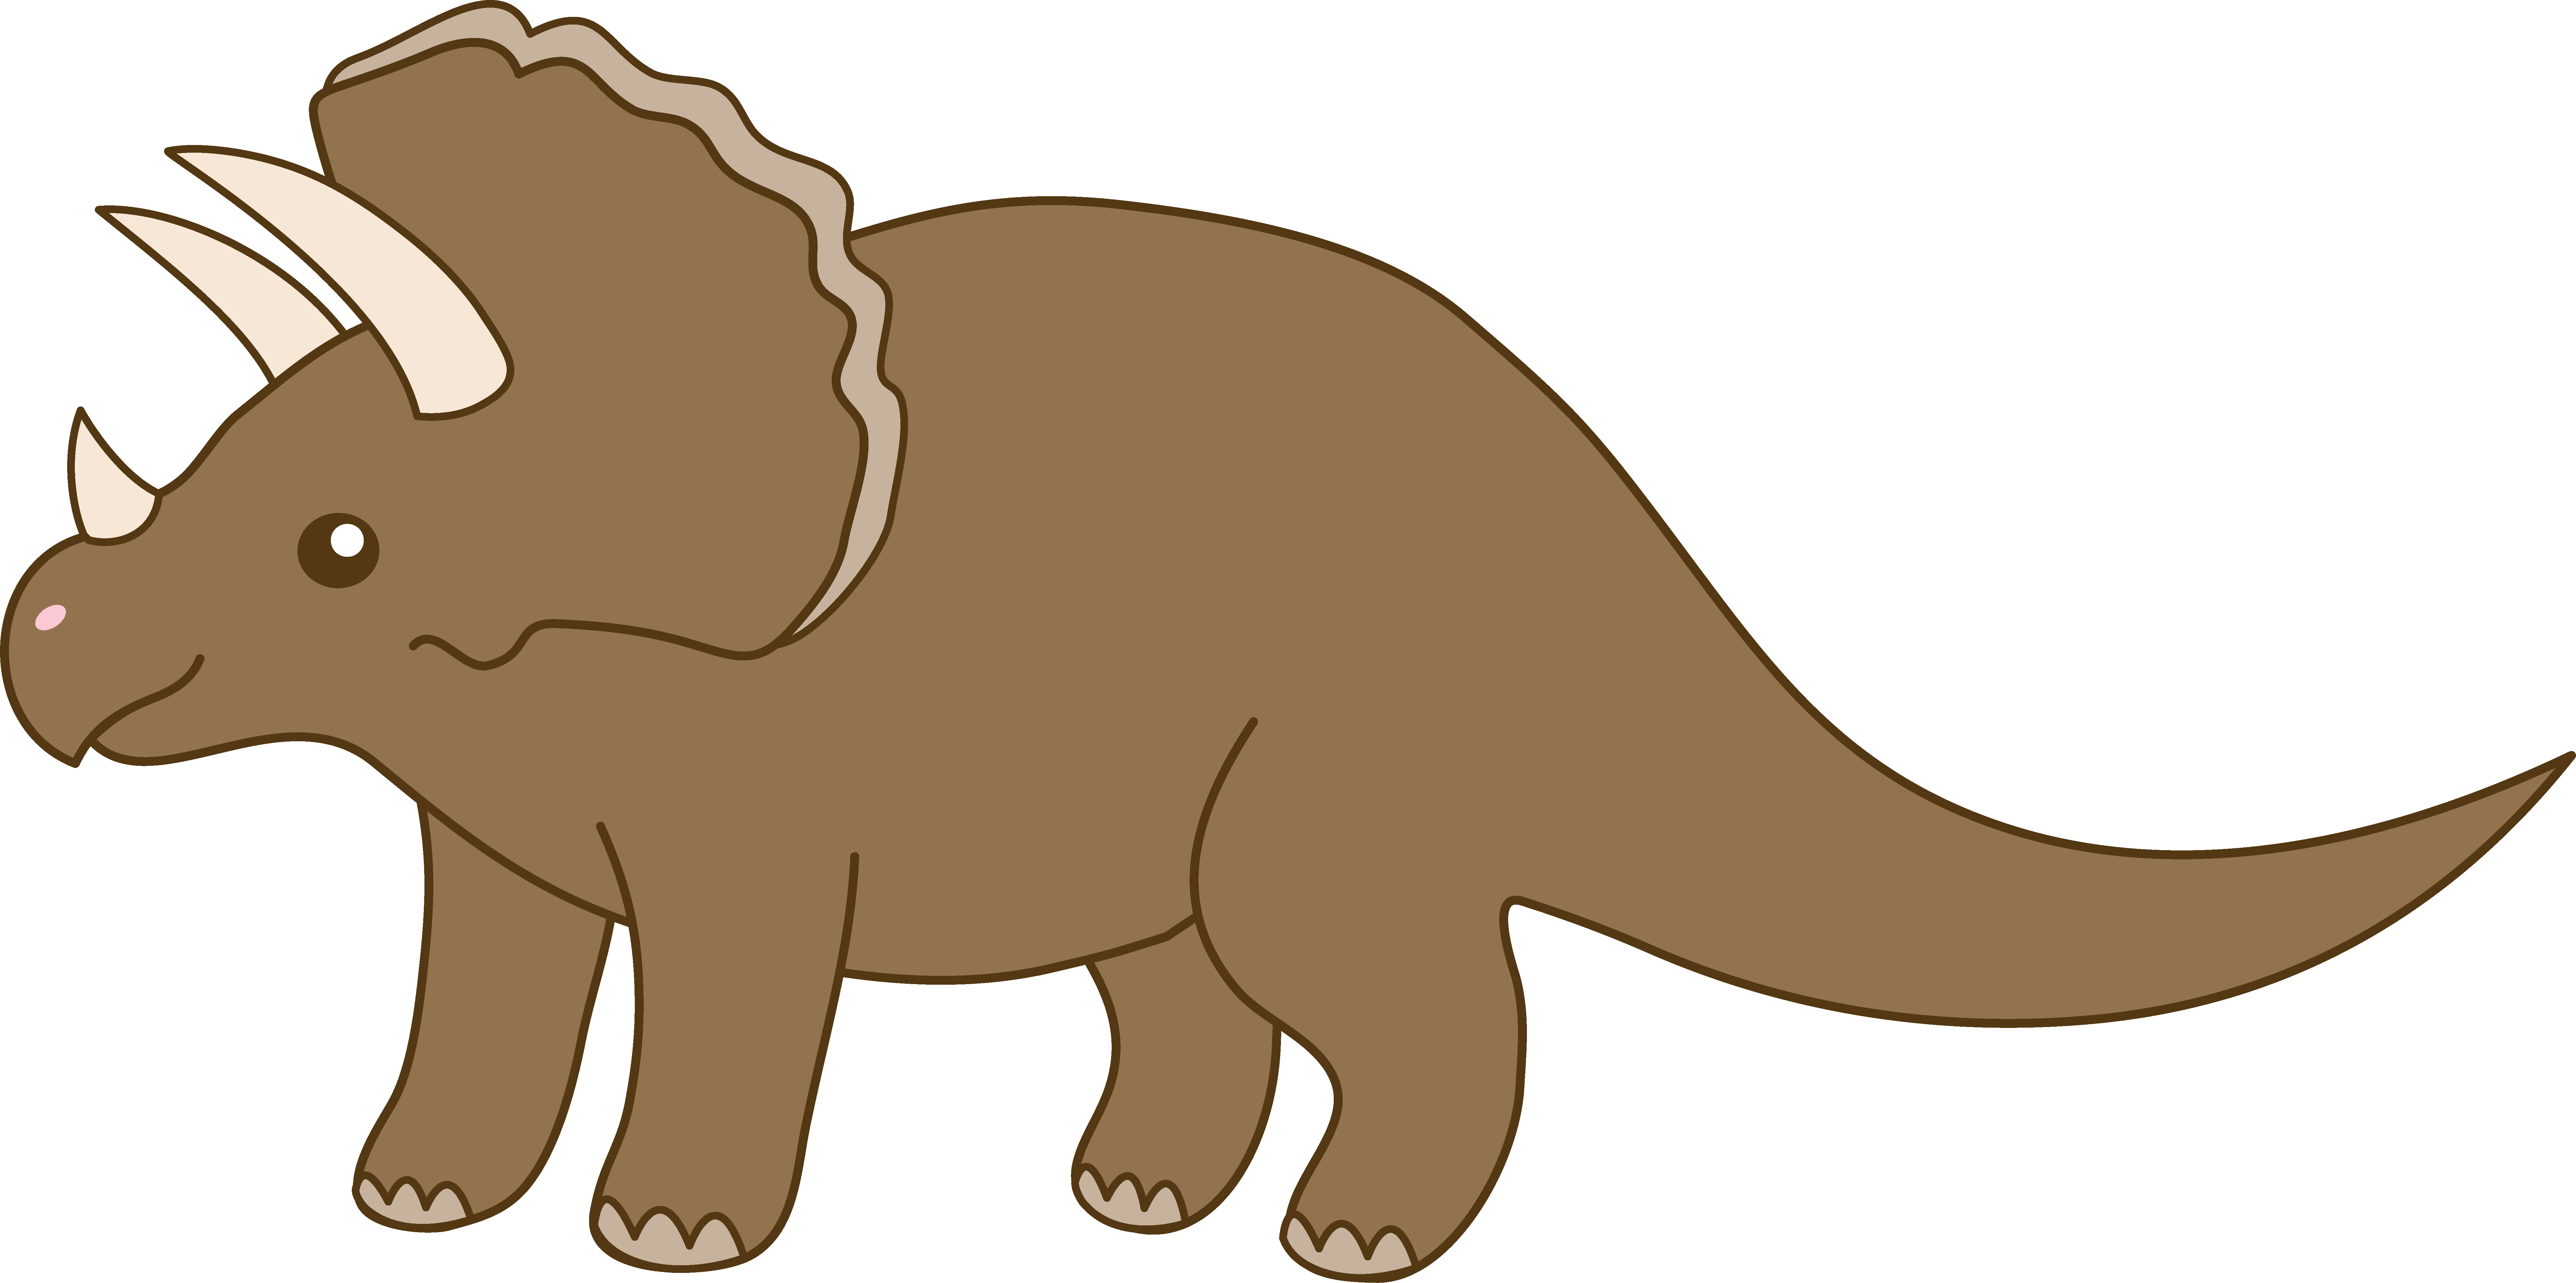 Dig clipart verb. Dinosaur clip art free